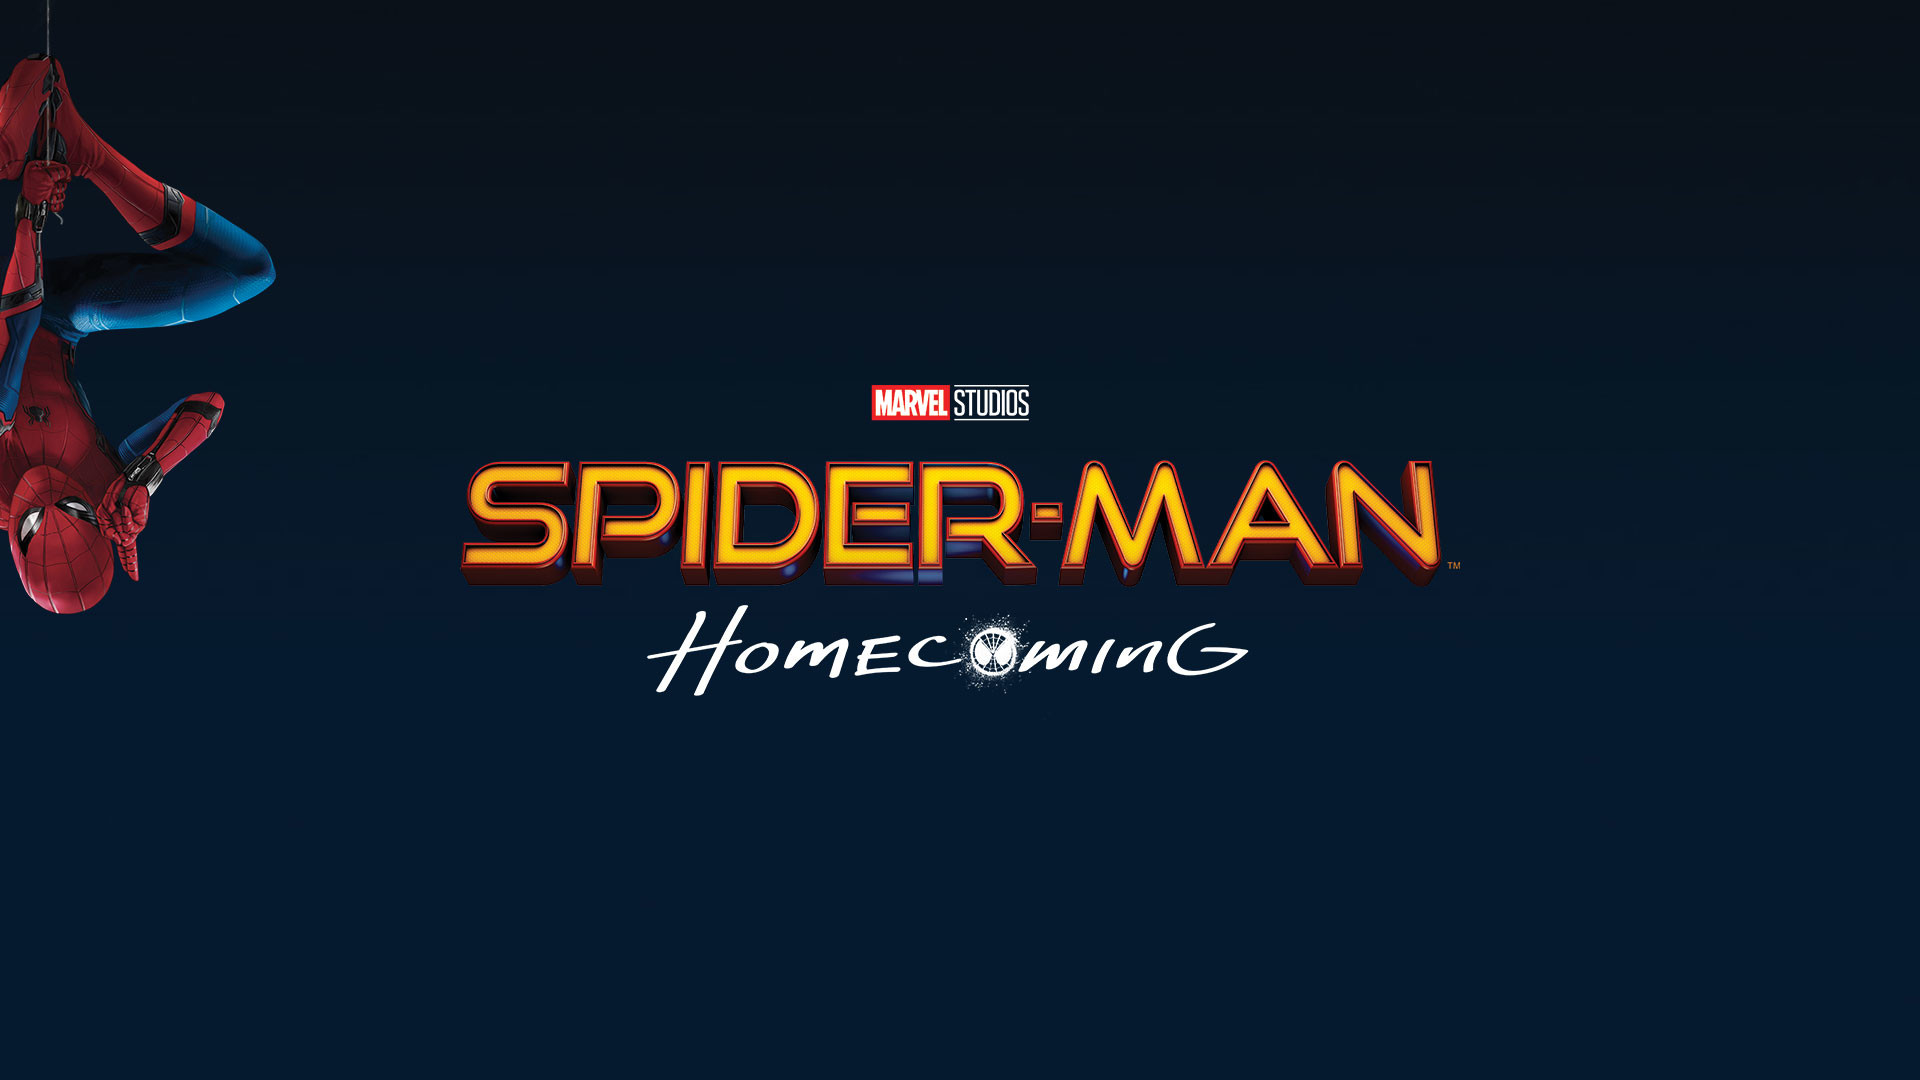 Spider-Man Homecoming Logo Wallpaper